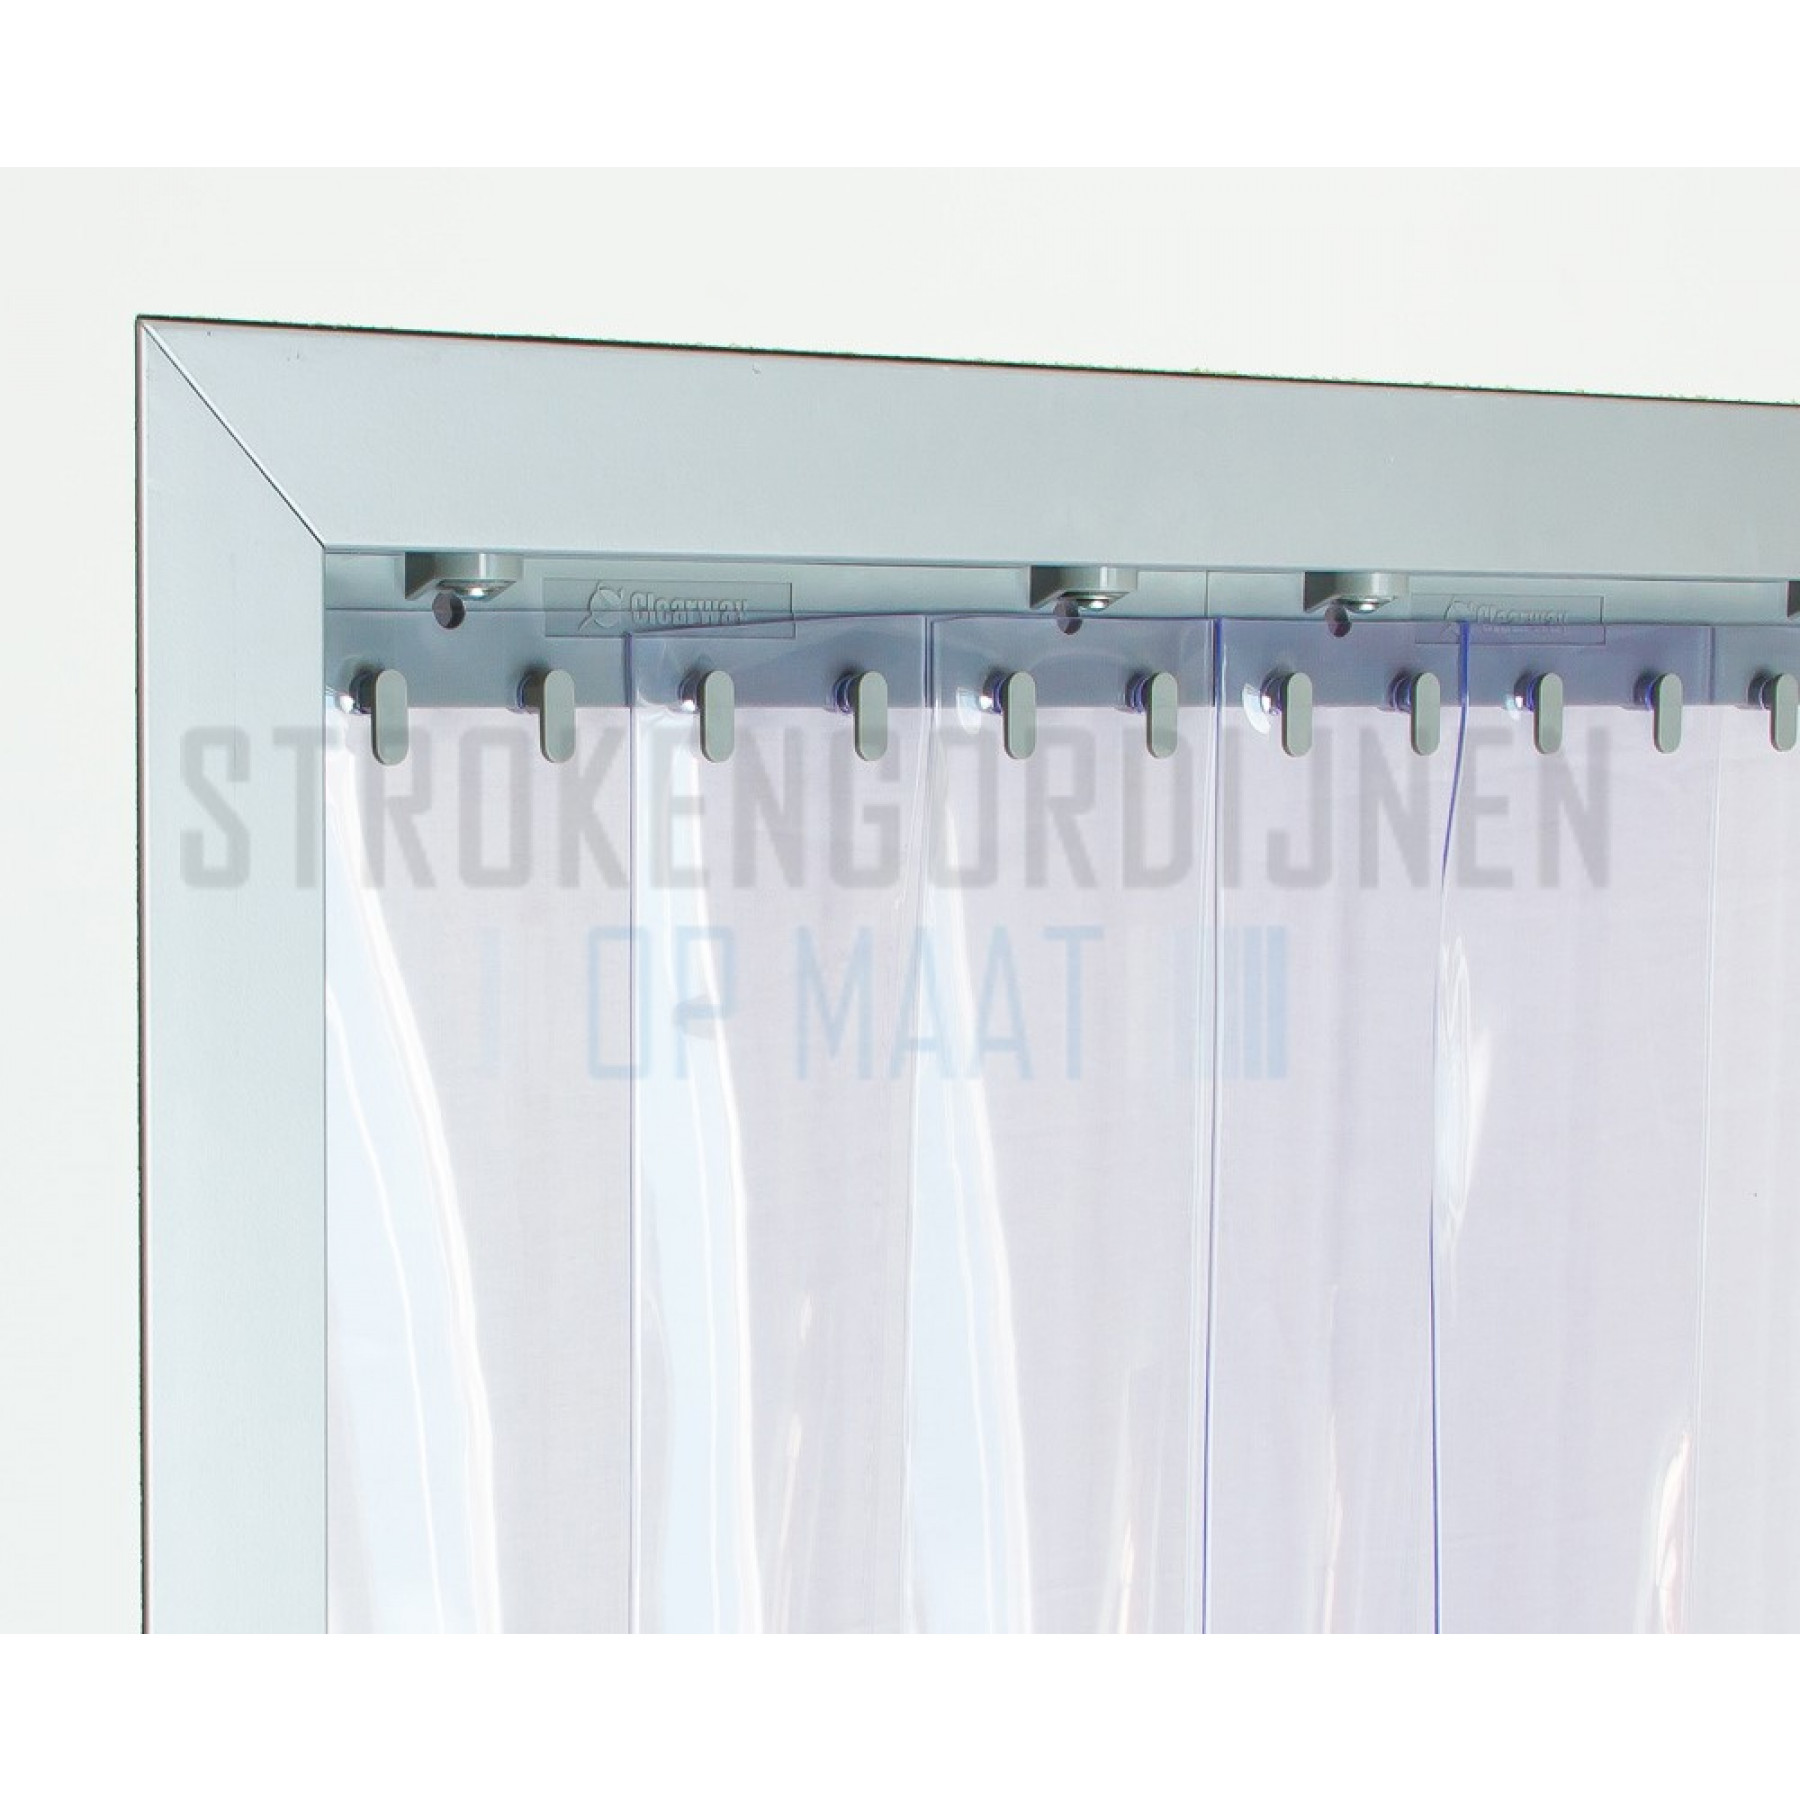 Aufhängesystem, Kunststoff, 610 mm lang